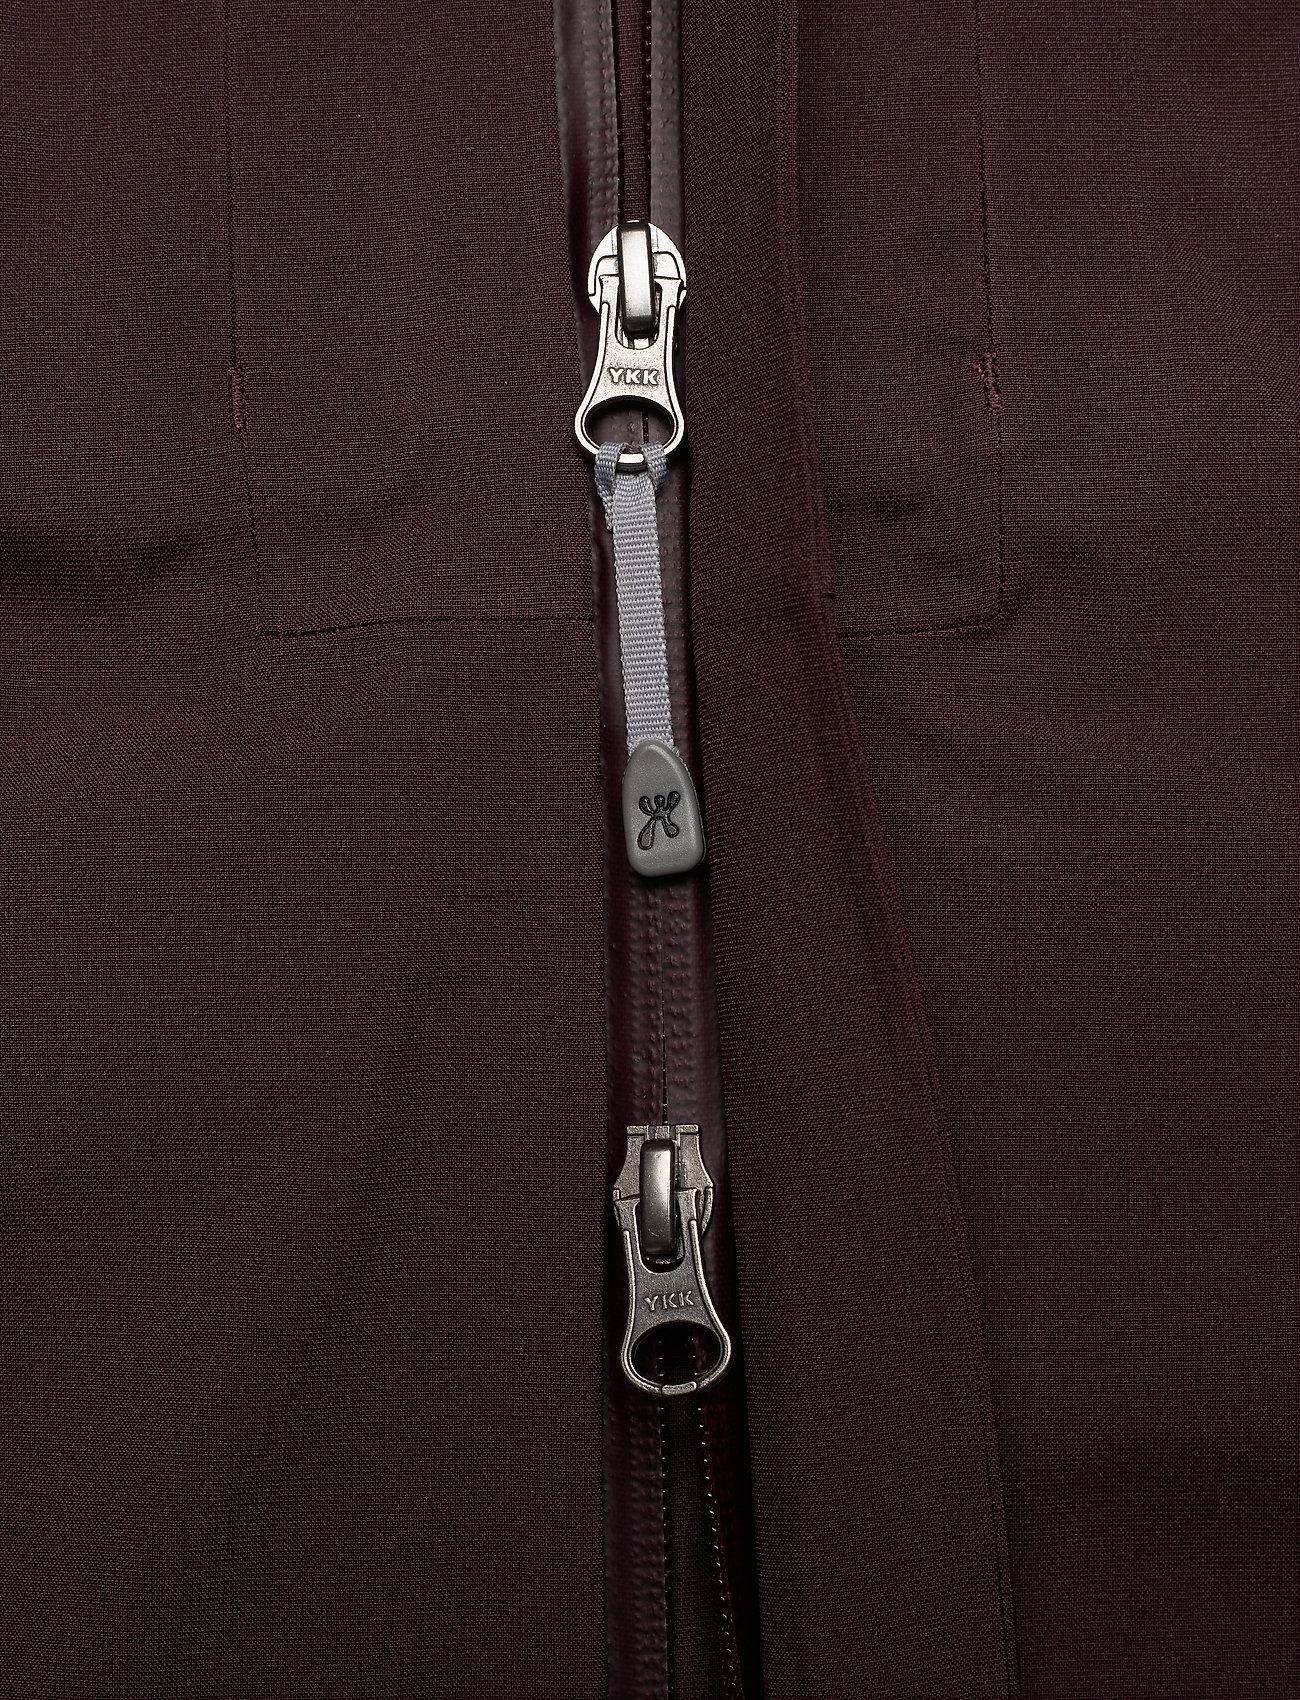 M's Rollercoaster Jacket (Red Illusion) (600 €) - Houdini jOe35